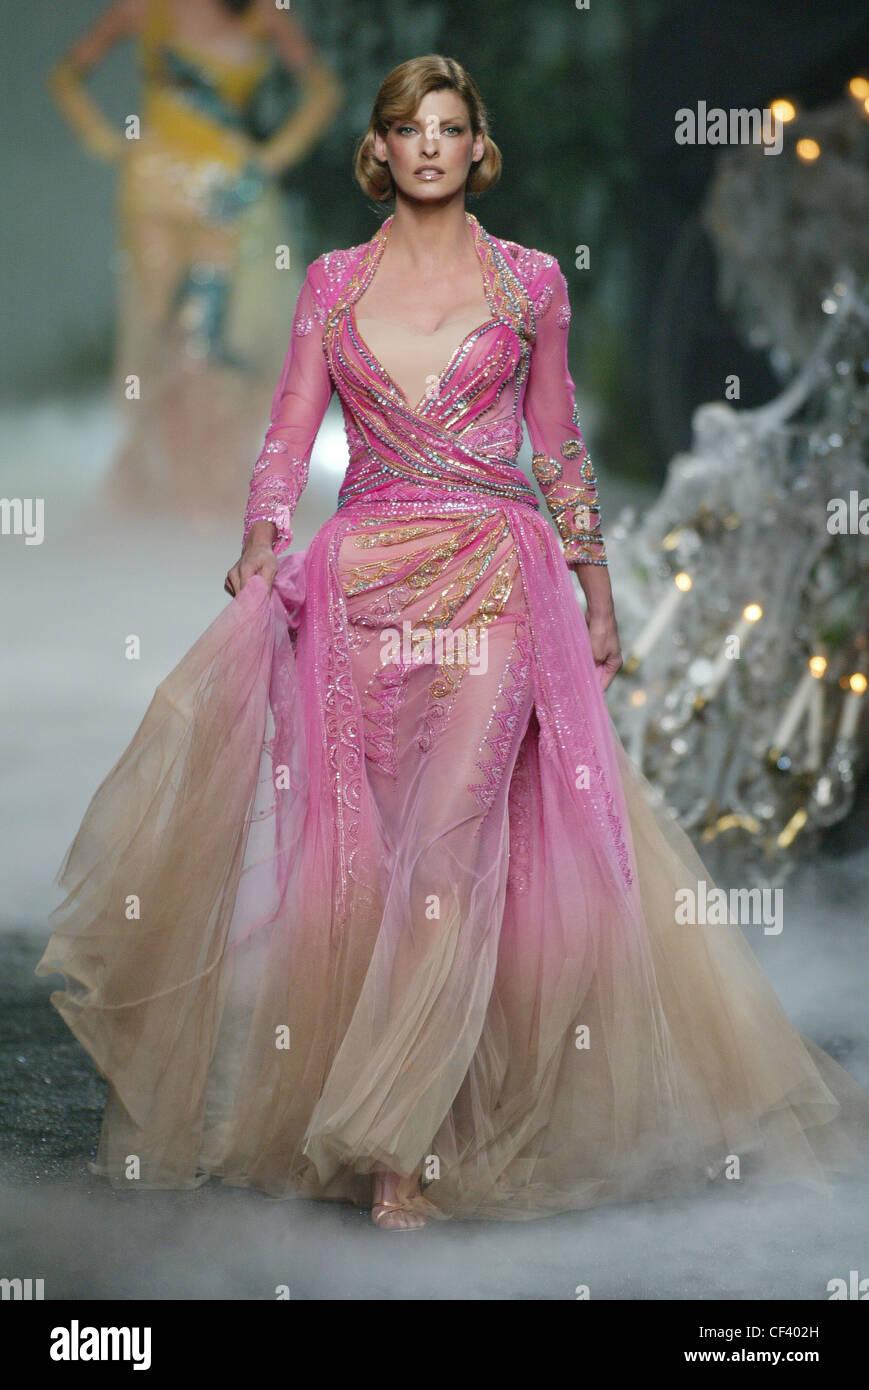 Chanel Paris, Haute Couture A W Linda Evangelista wearing pink ...